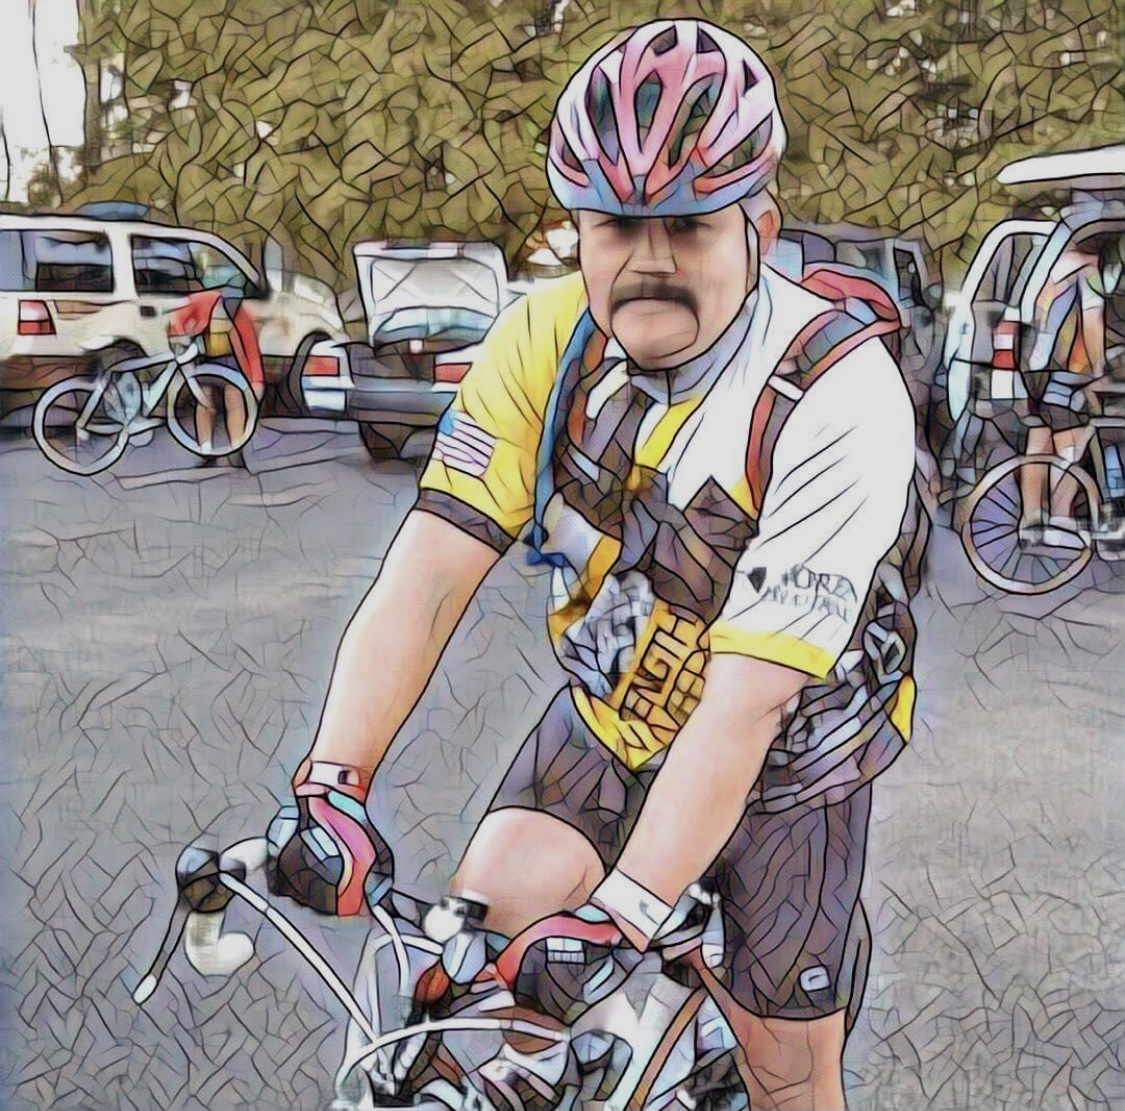 Scott Goldbach - Norton's Ride To Conquer Cancer